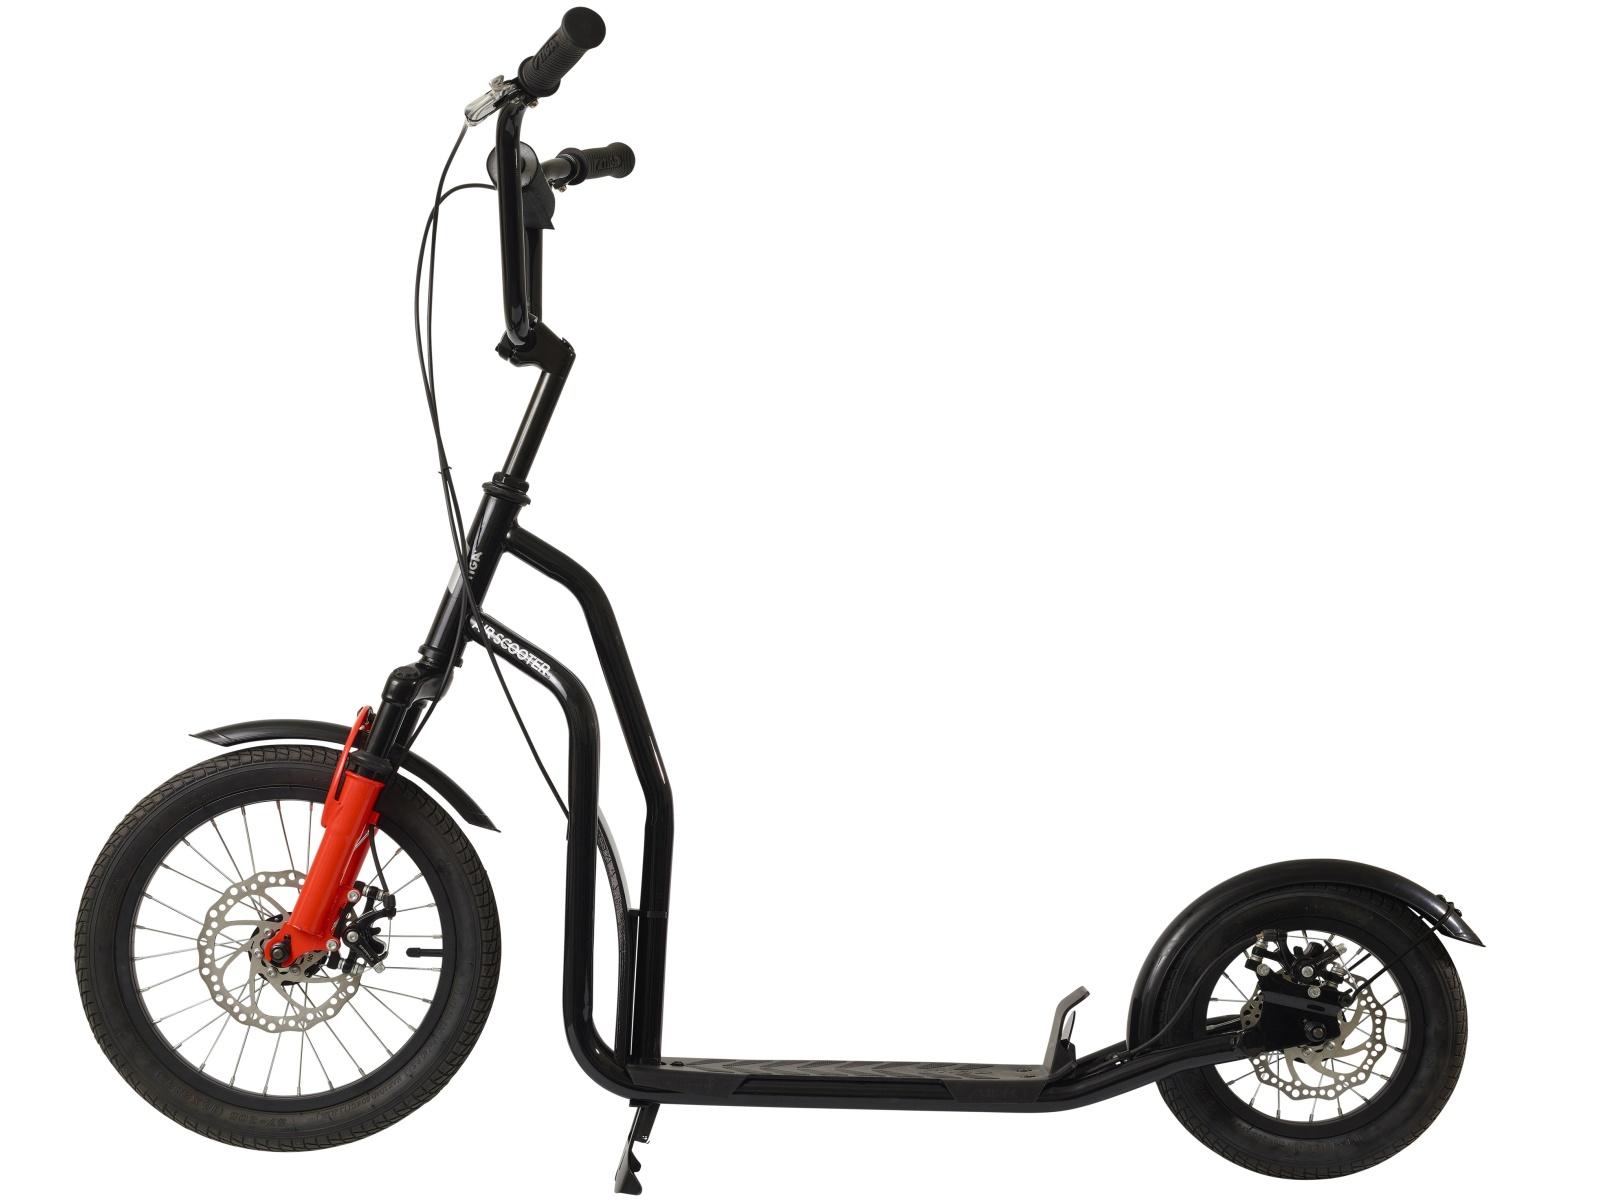 Kolobežka STIGA Air Scooter SA 16-12